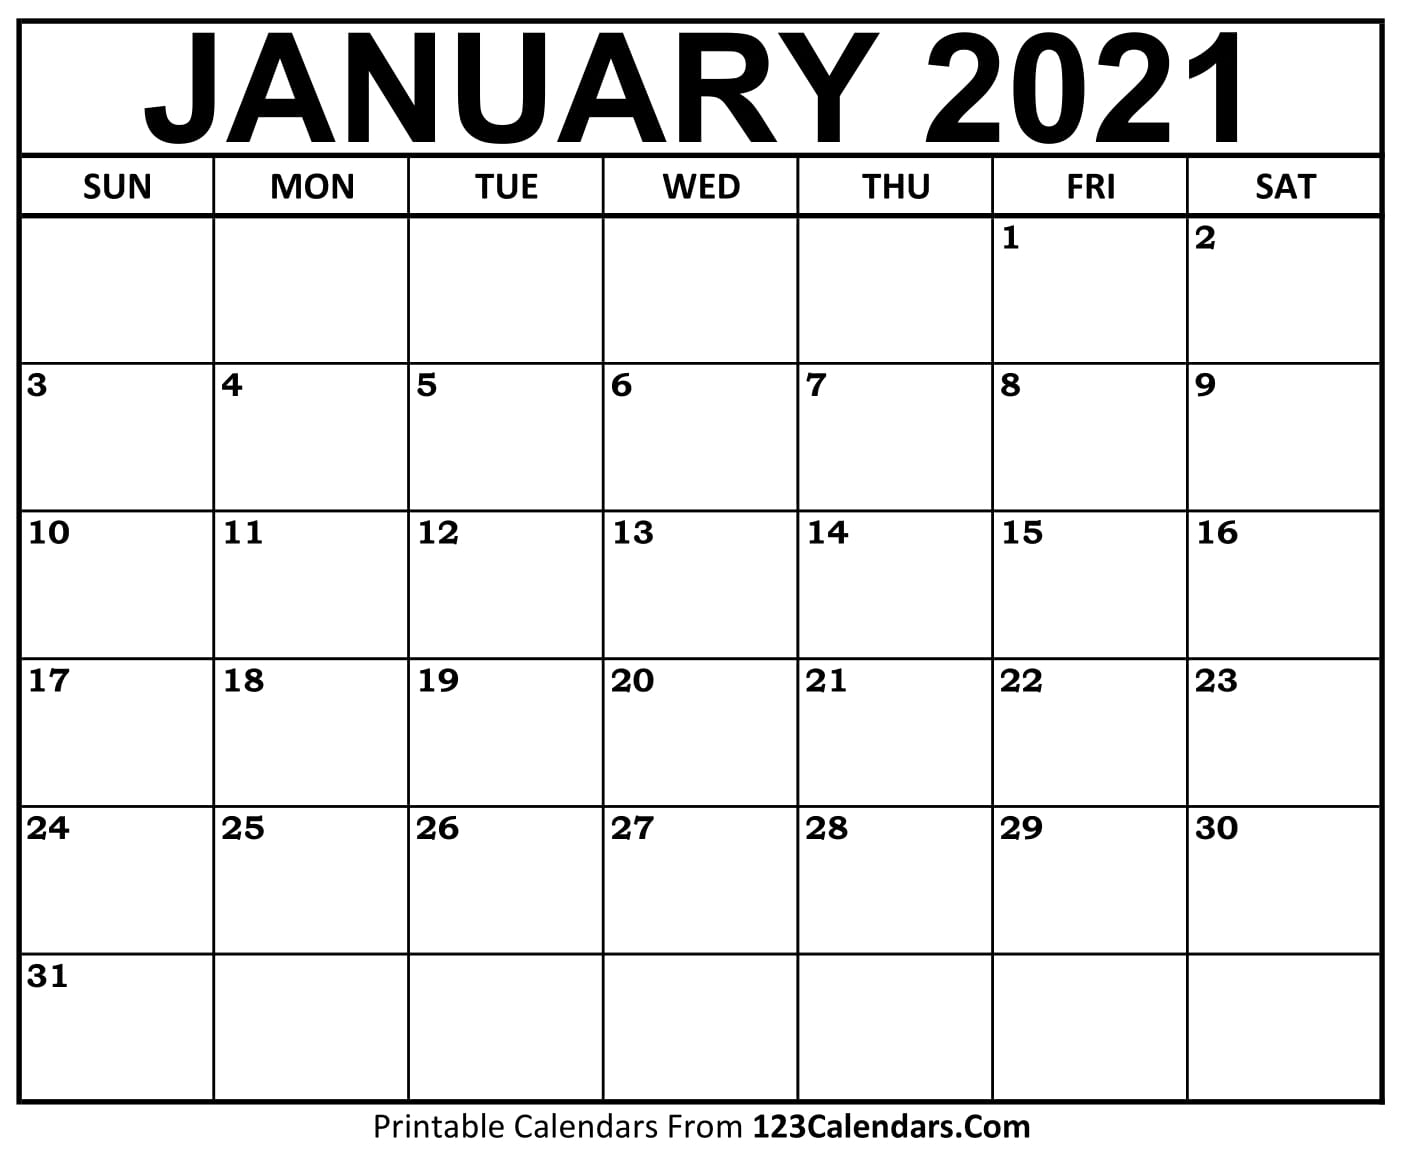 Get January 2021 Calendar